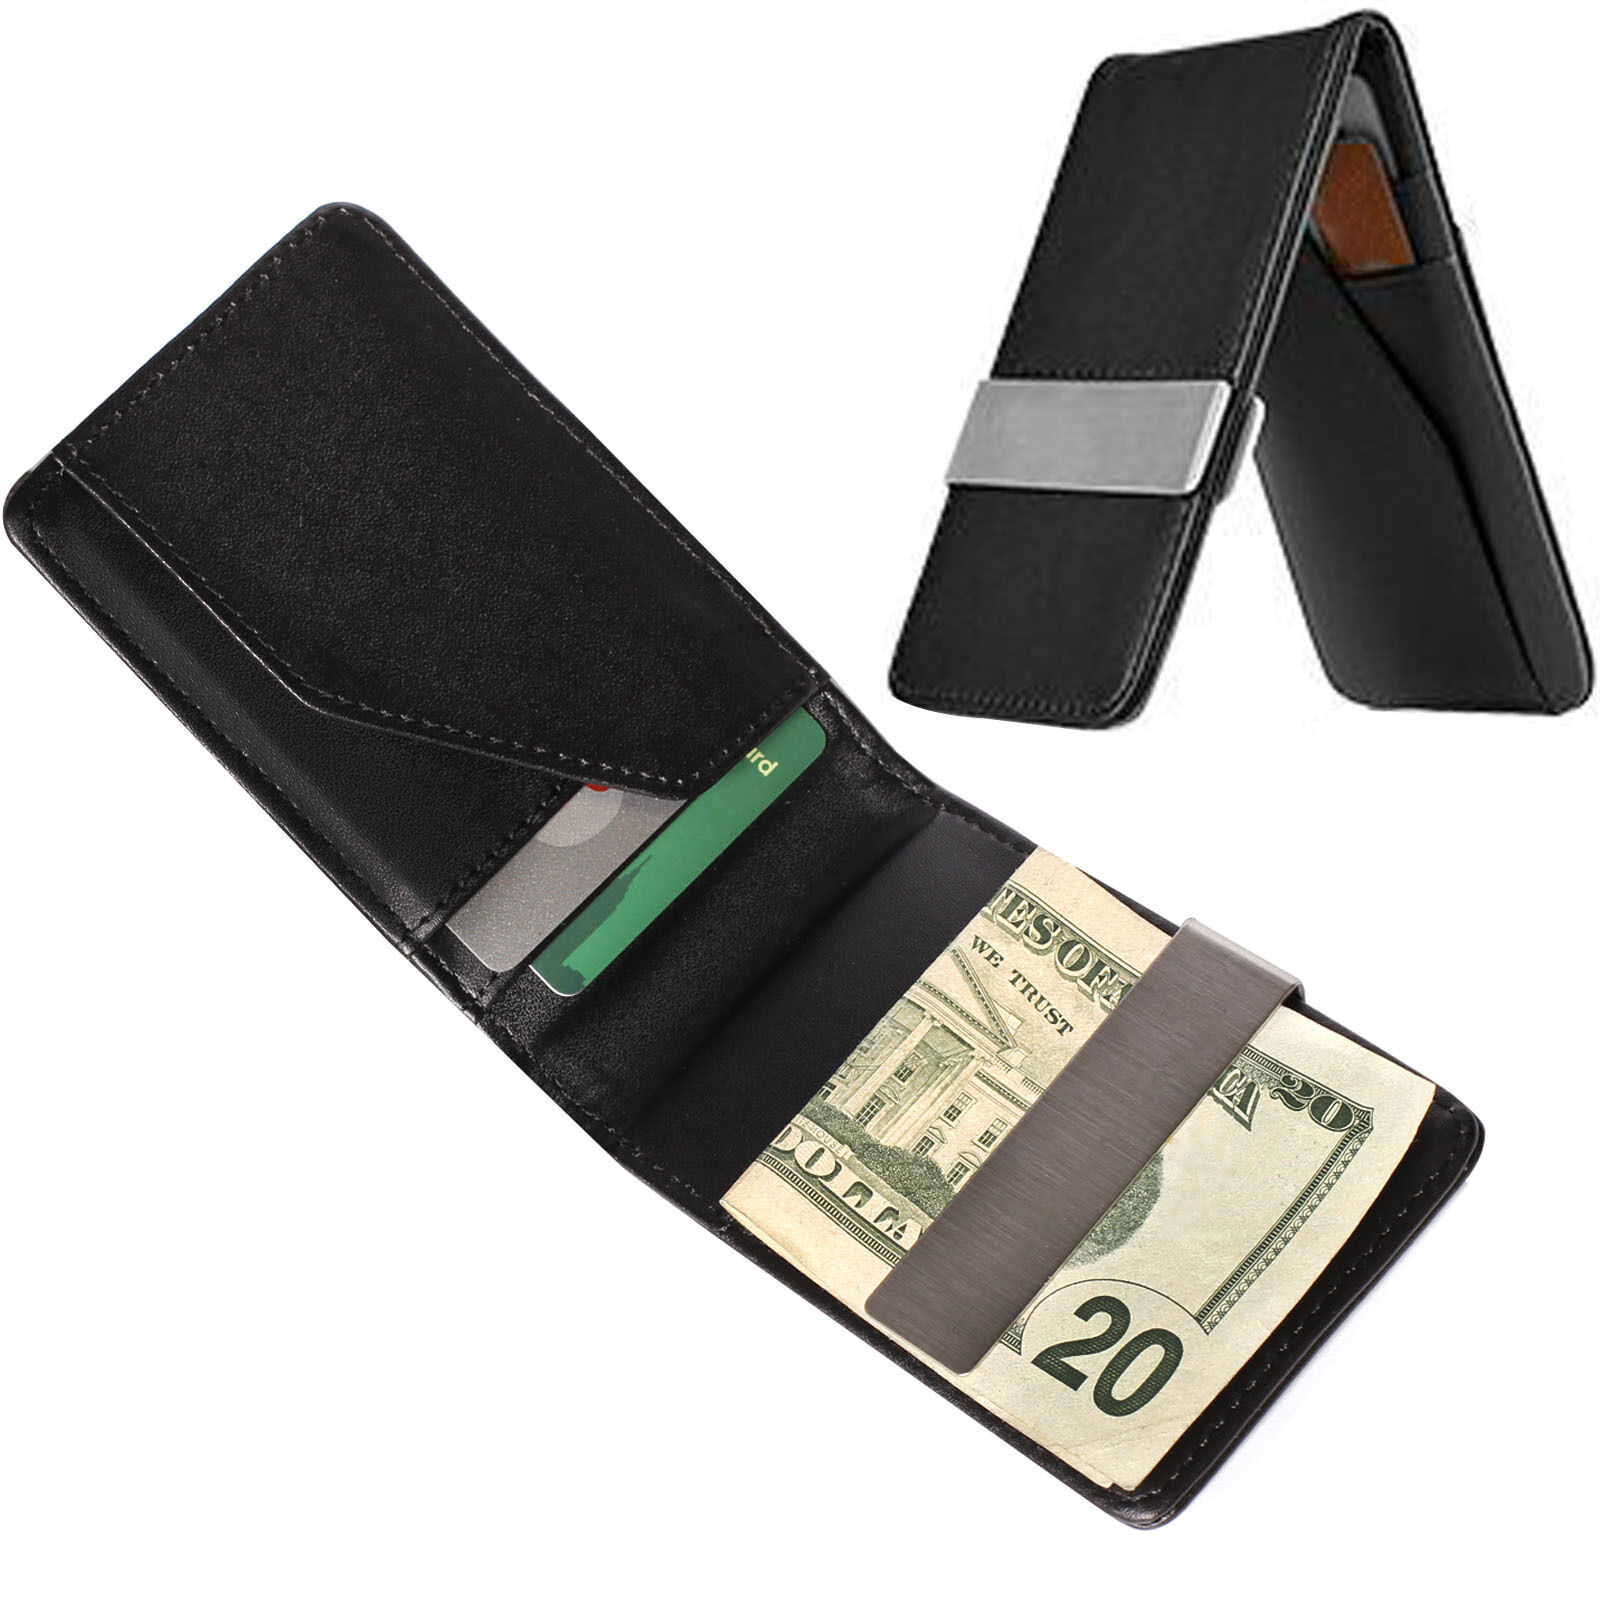 Leather ID Holder | eBay